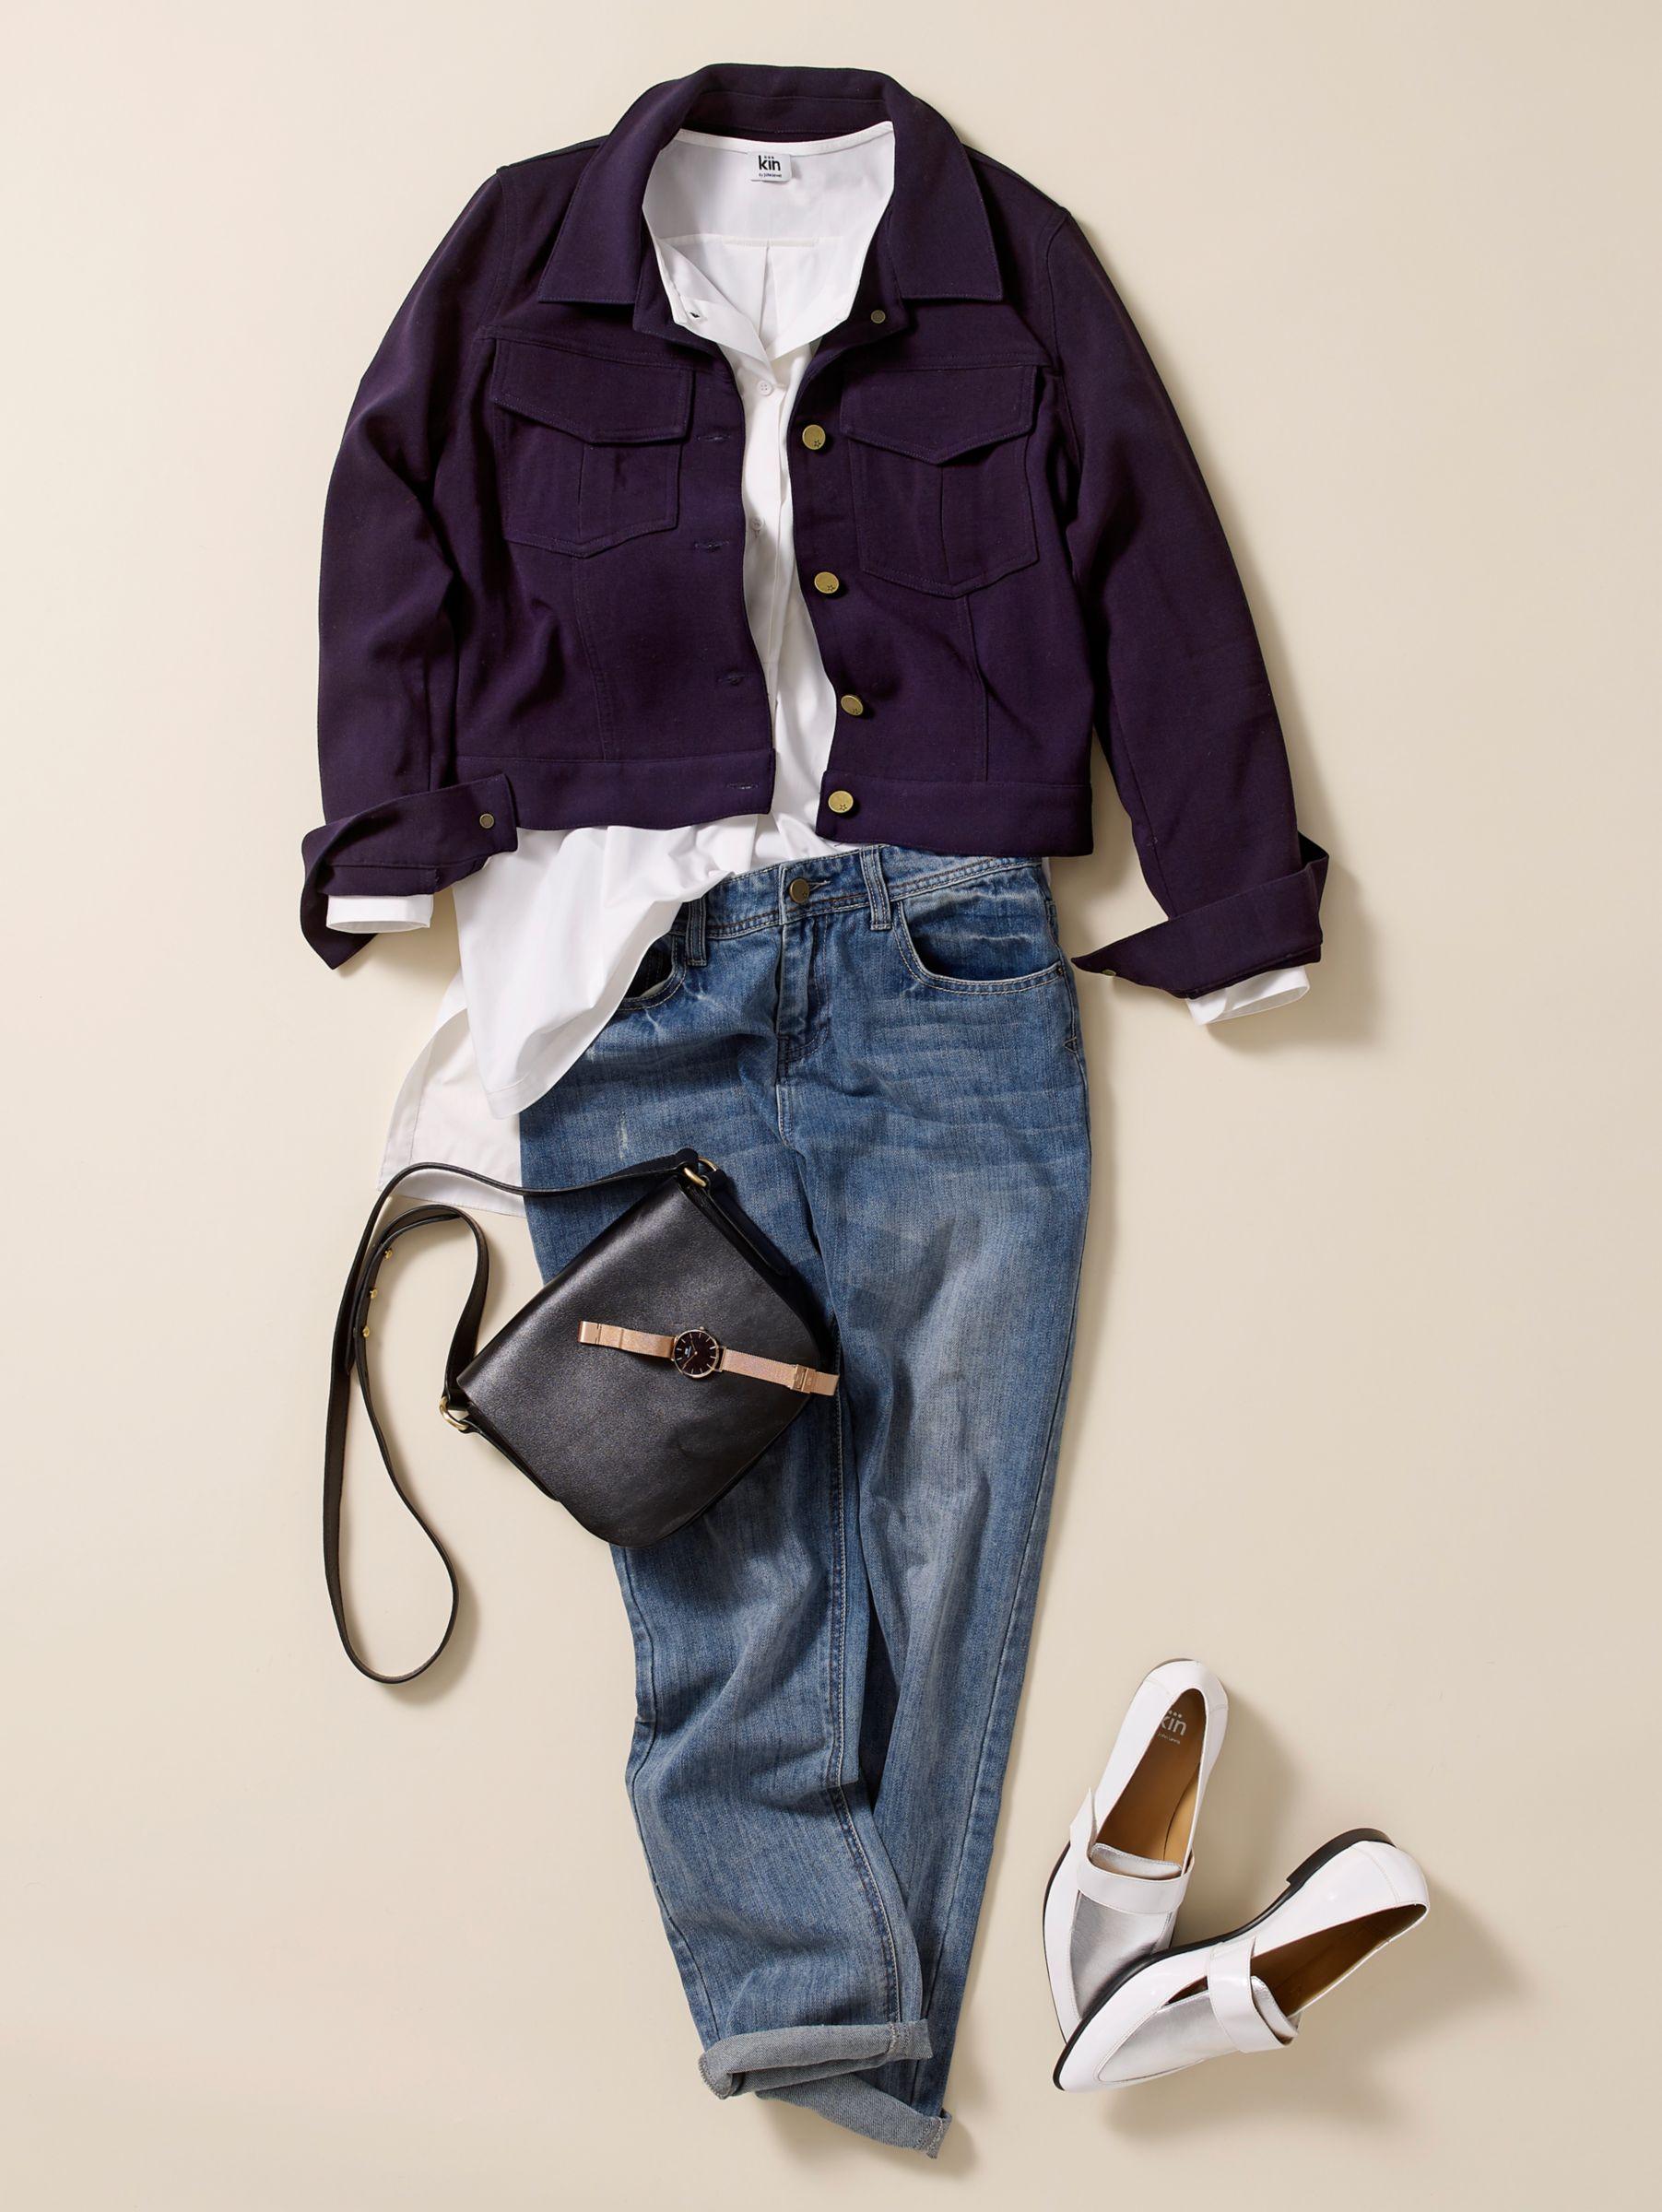 How to wear boyfriend jeans in the day